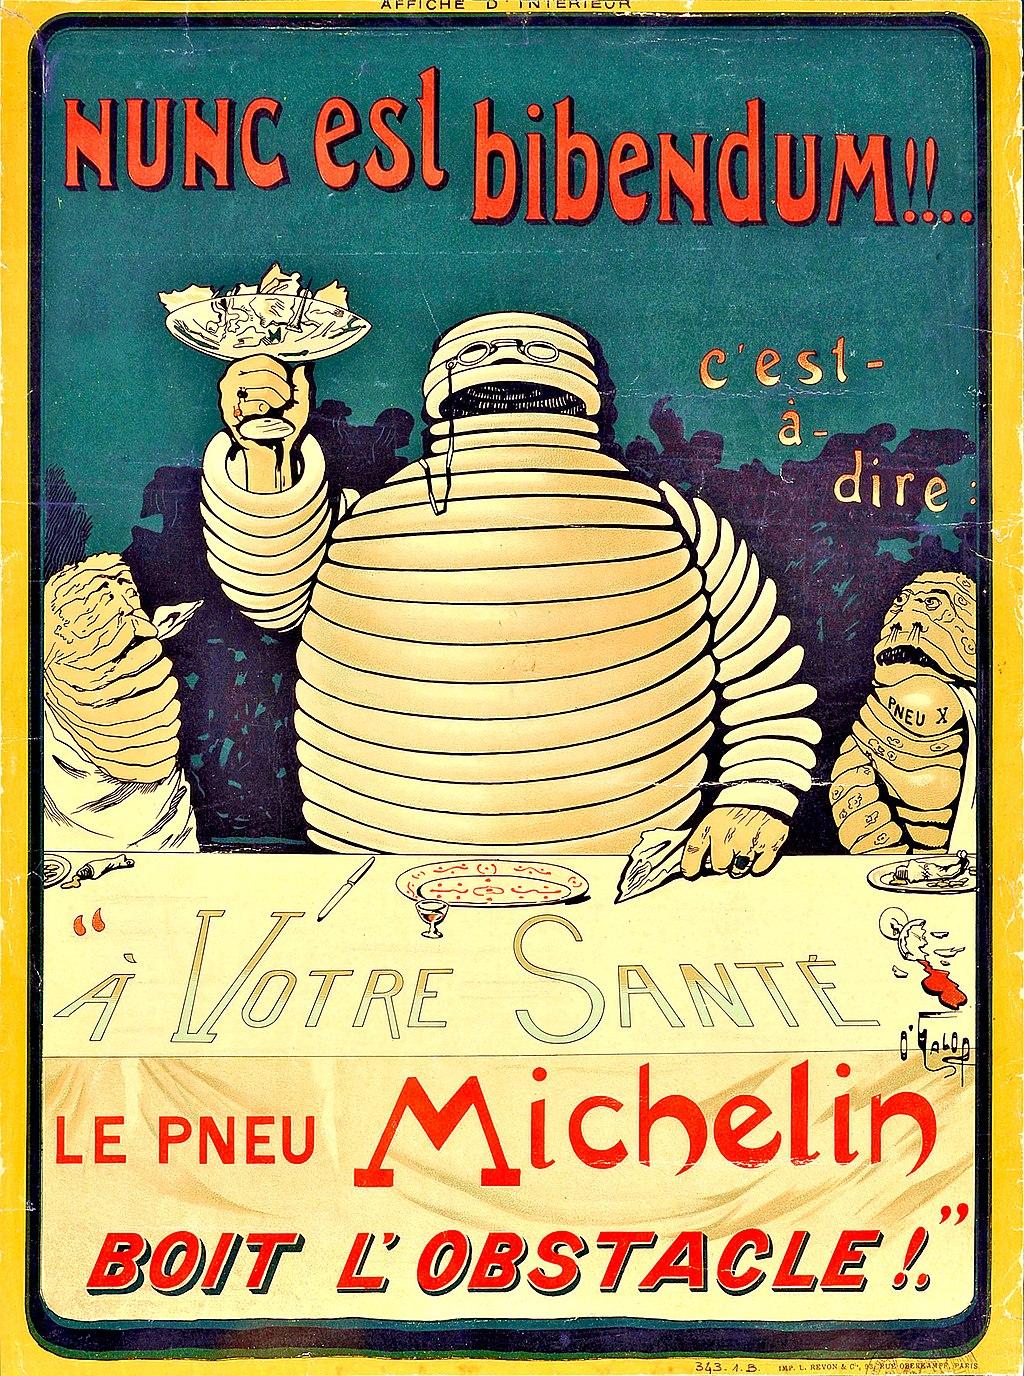 1024px-Michelin_Poster_1898.jpg